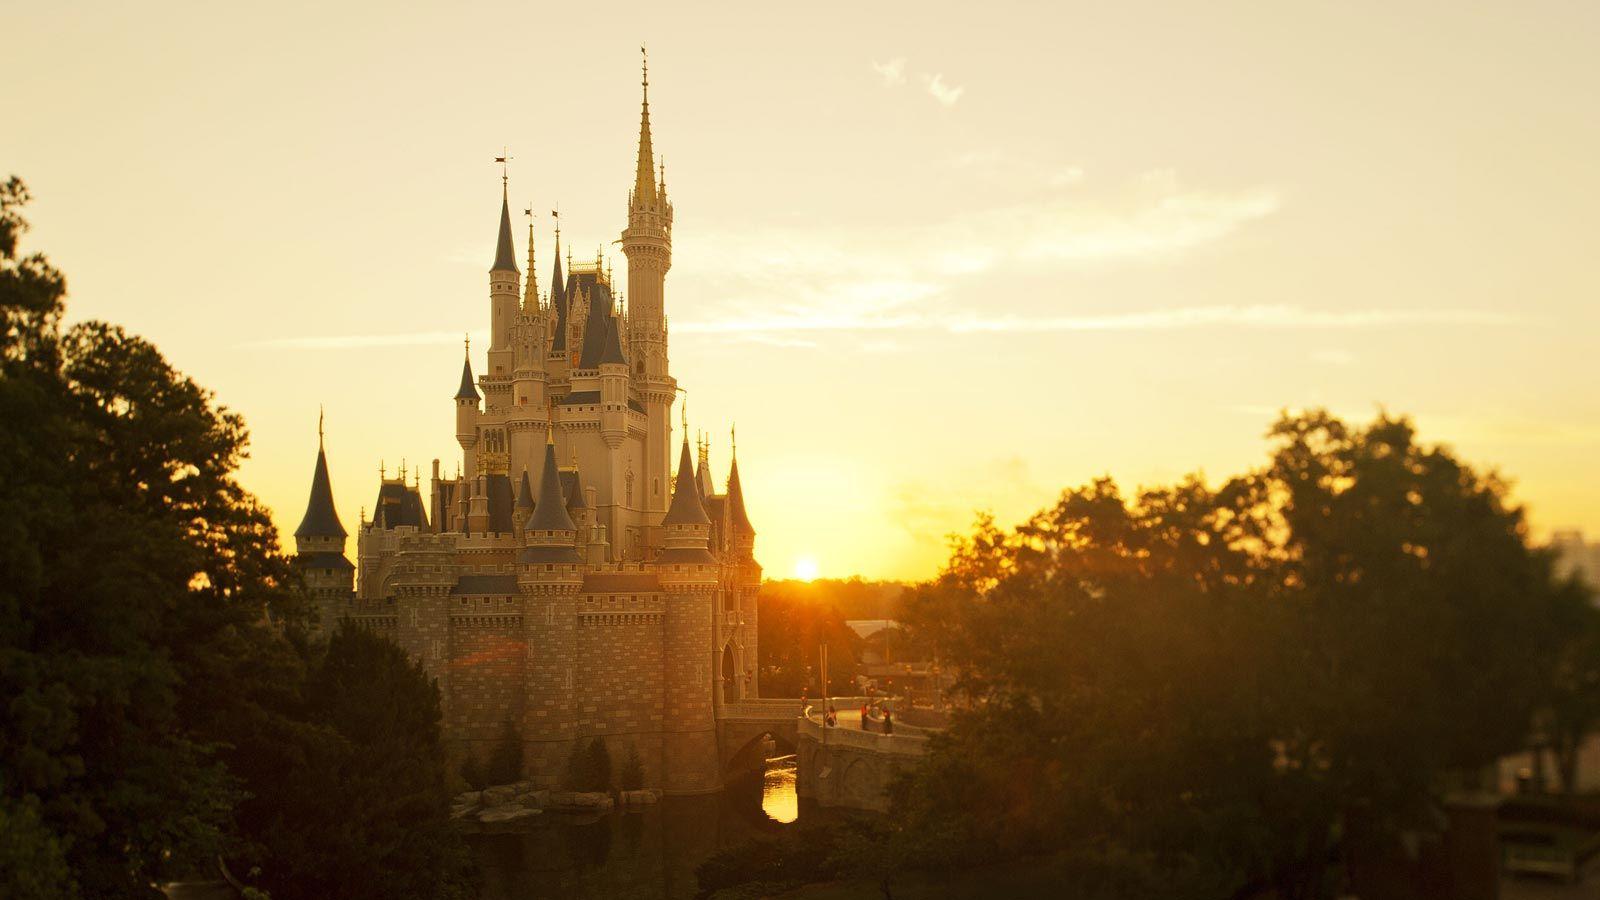 Disney Vacations Walt disney world vacations, Disney